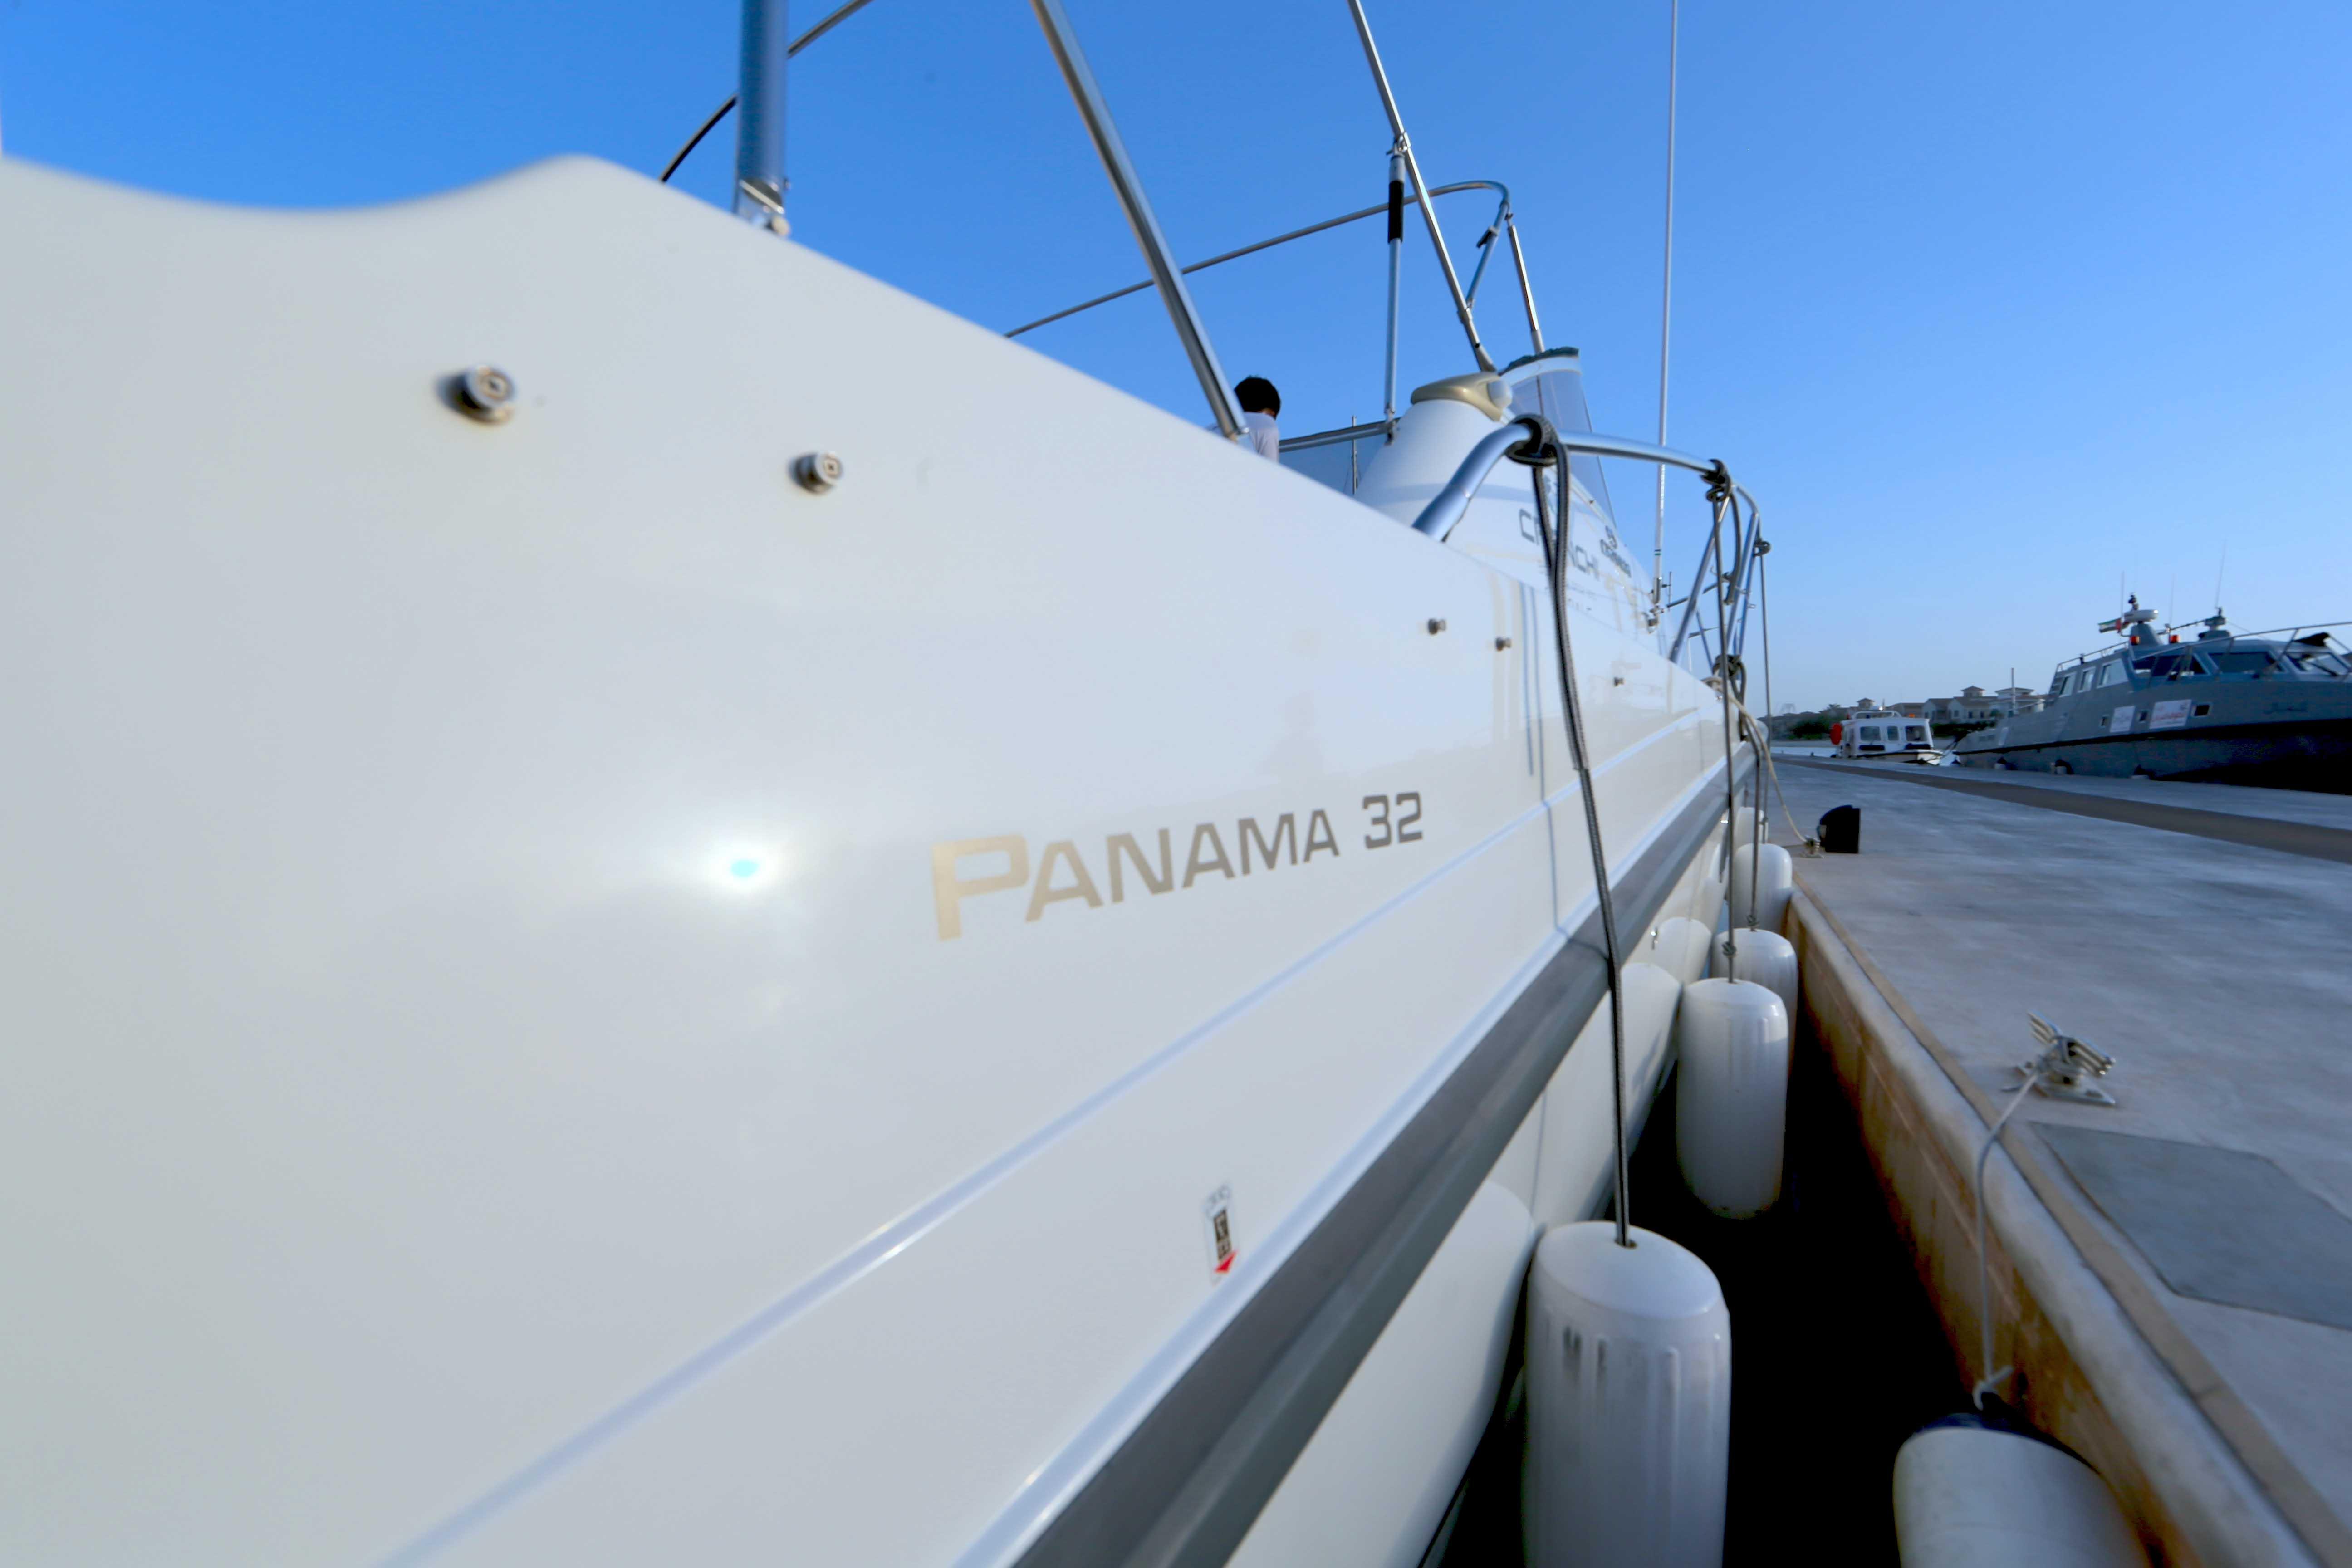 Cranchi 32 Panama (4)